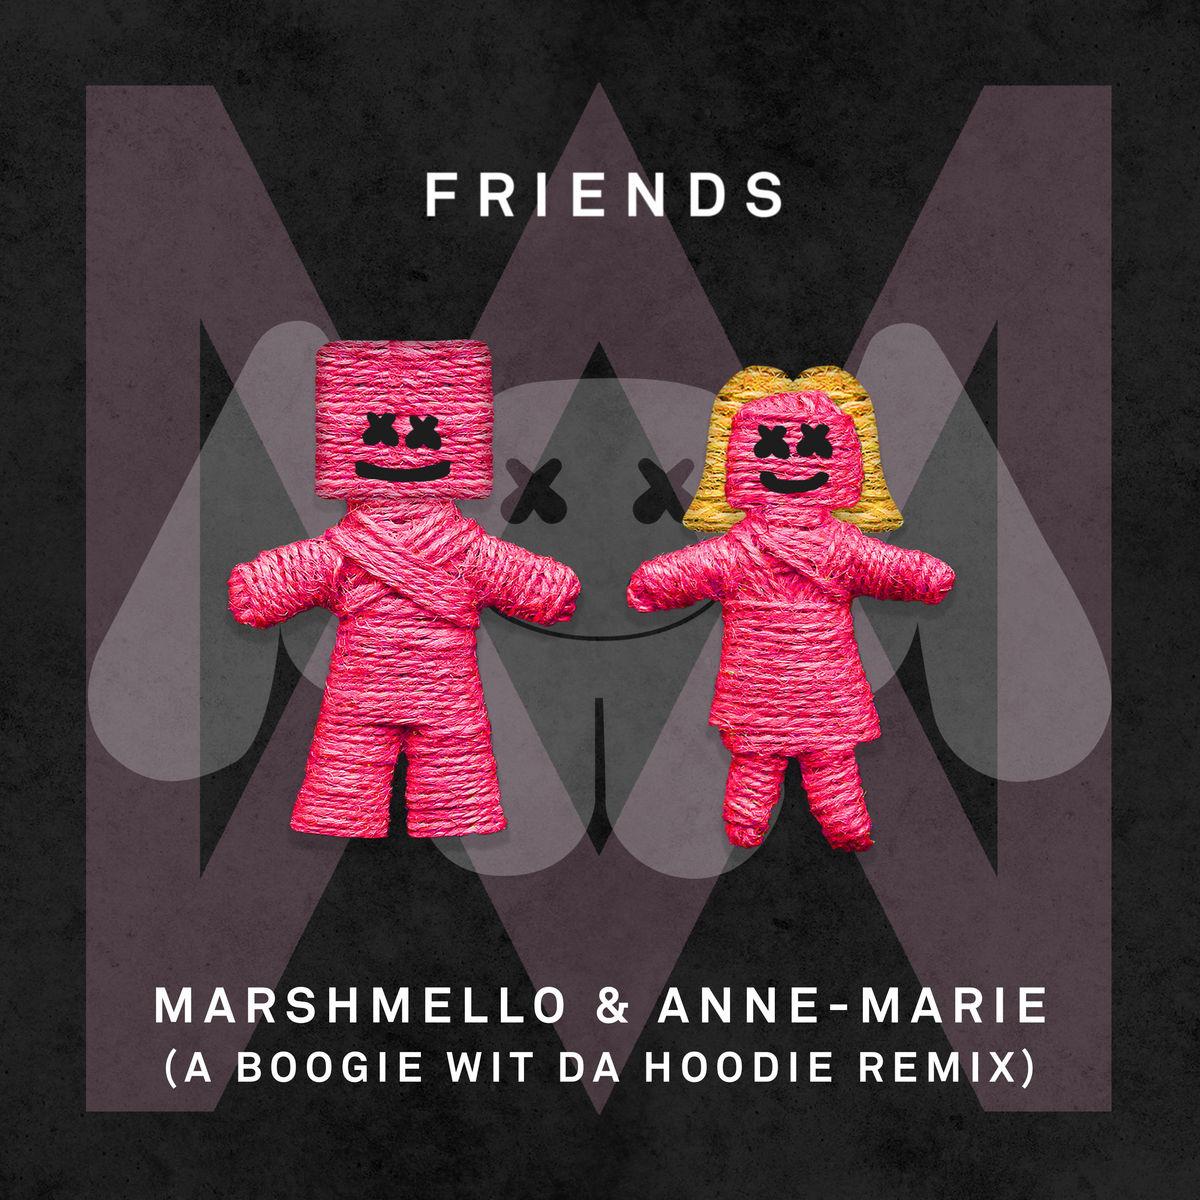 ultratop be - Marshmello & Anne-Marie - Friends